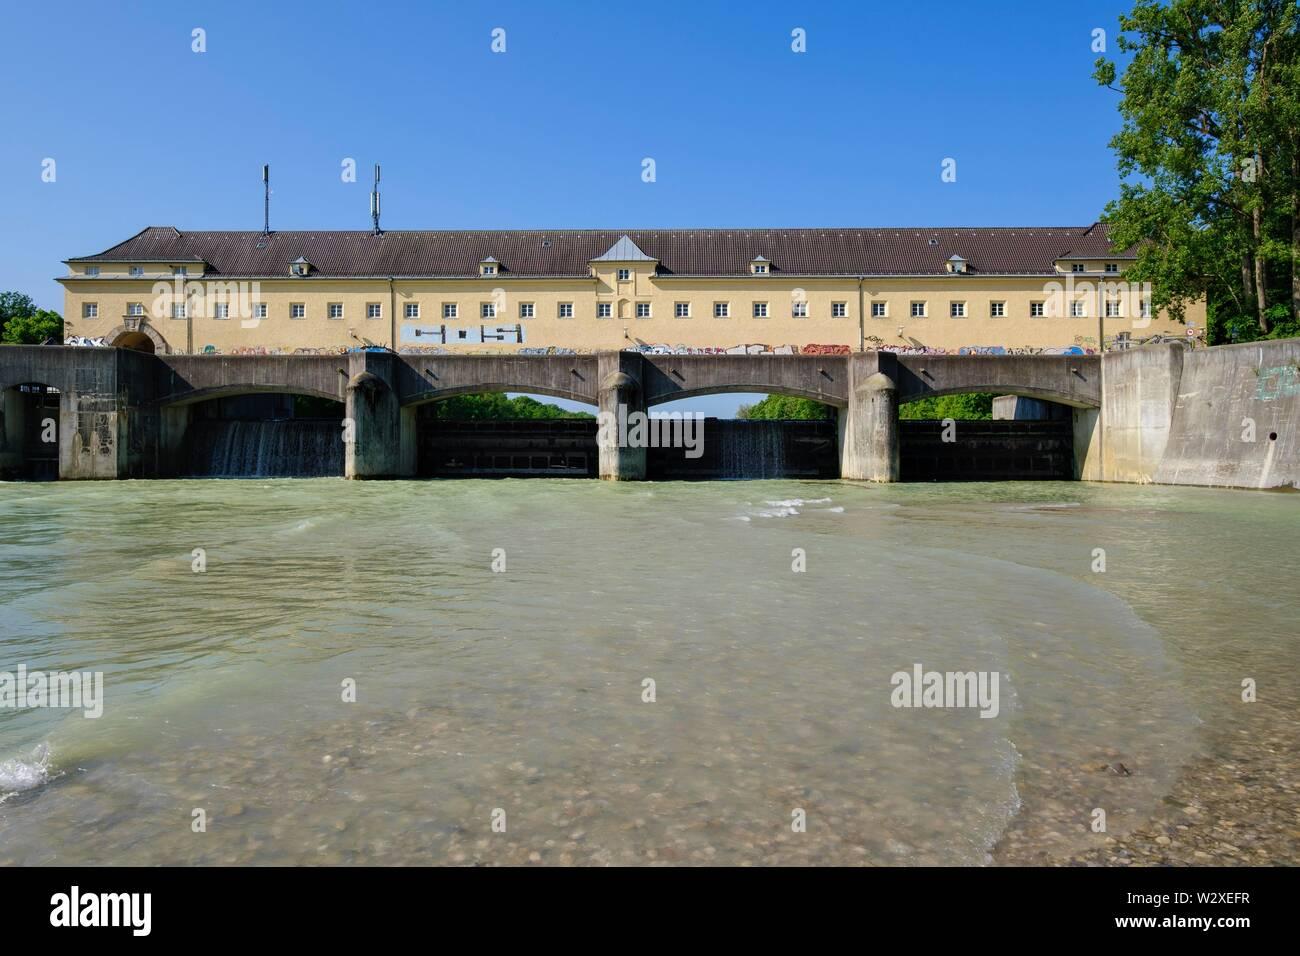 Weir Oberfohring at the Isar, Bogenhausen, Munich, Upper Bavaria, Bavaria, Germany - Stock Image